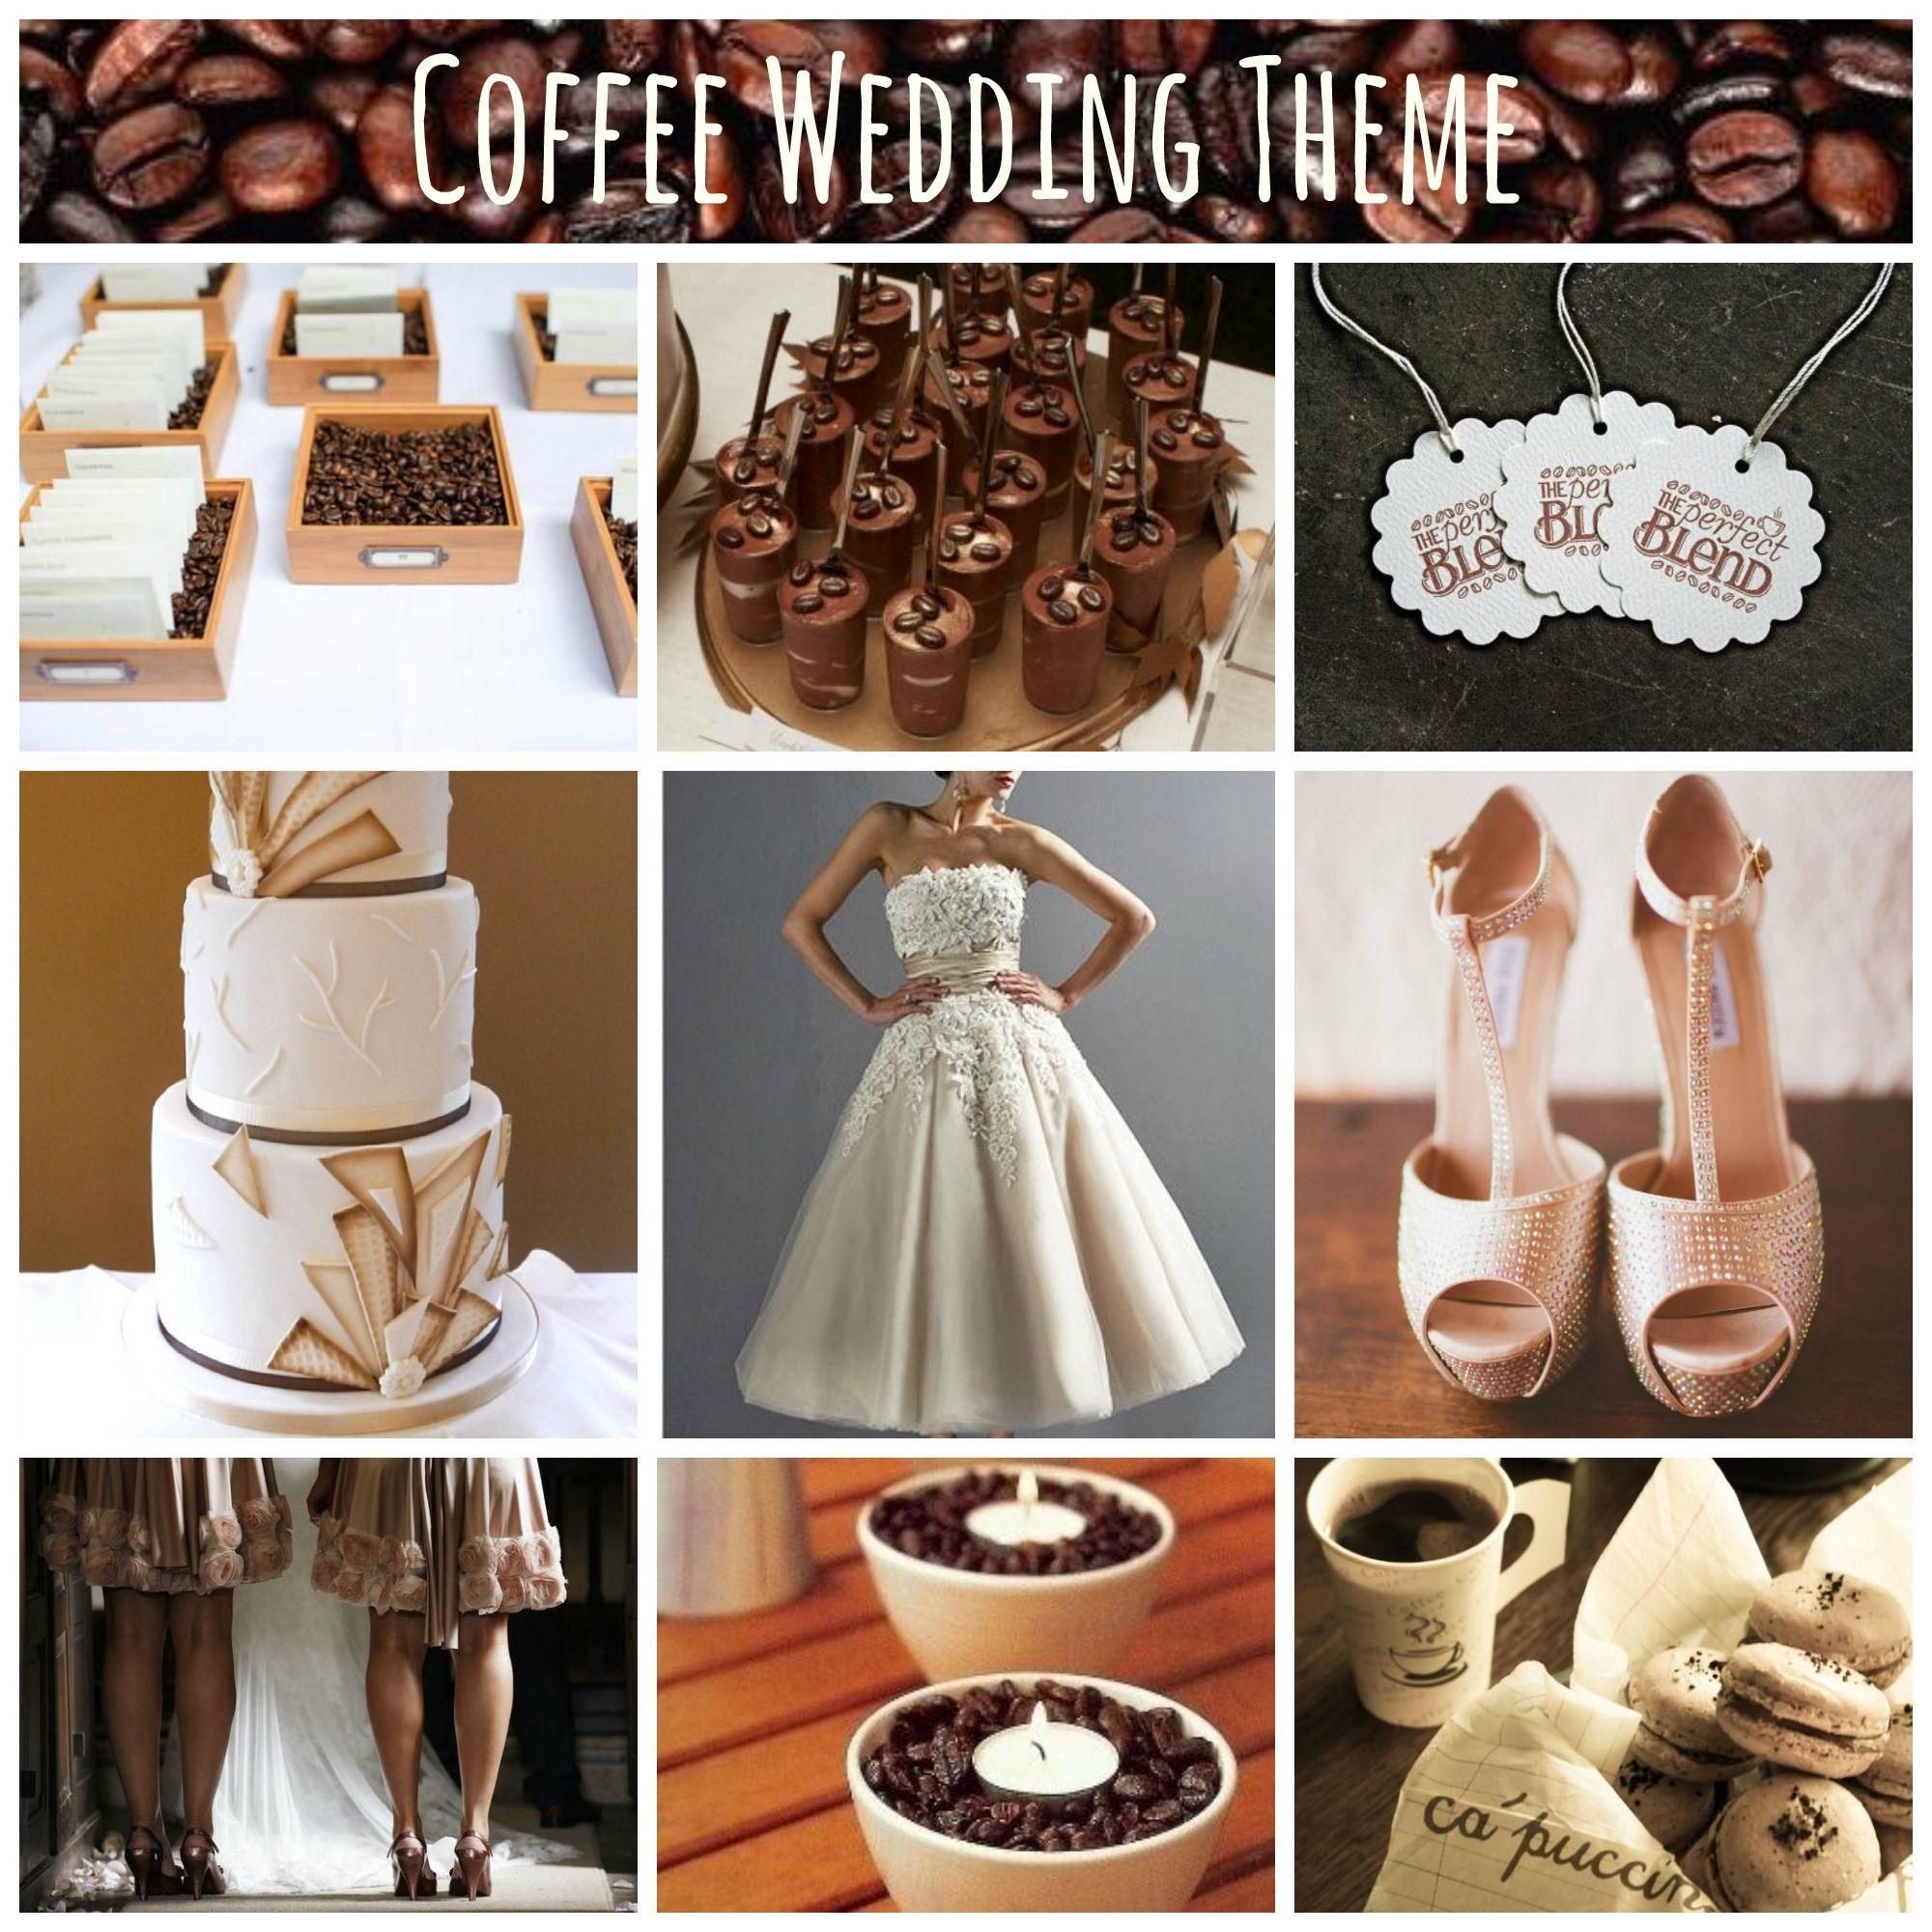 Coffee wedding theme wedding themes starbucks wedding